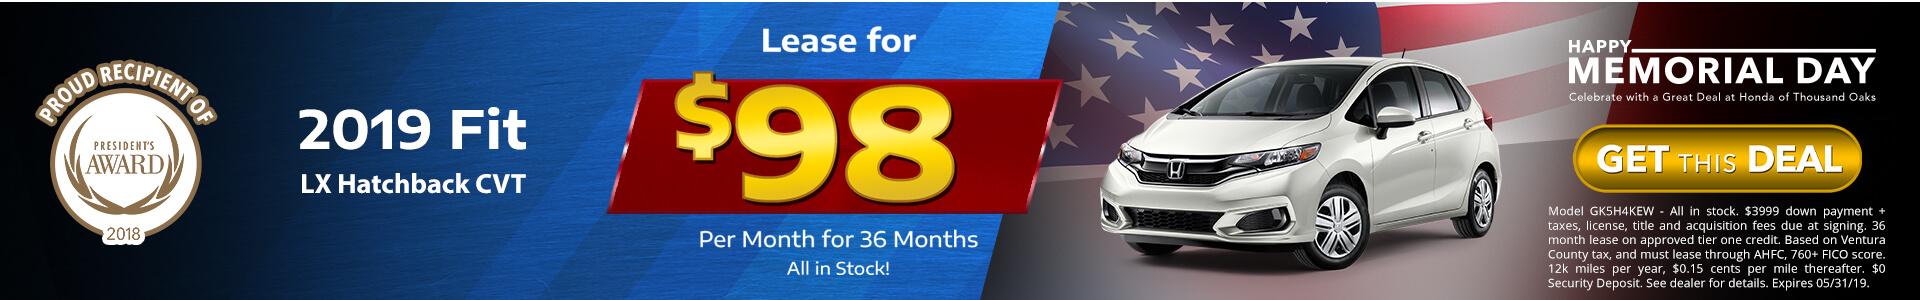 Honda Fit $98 Lease